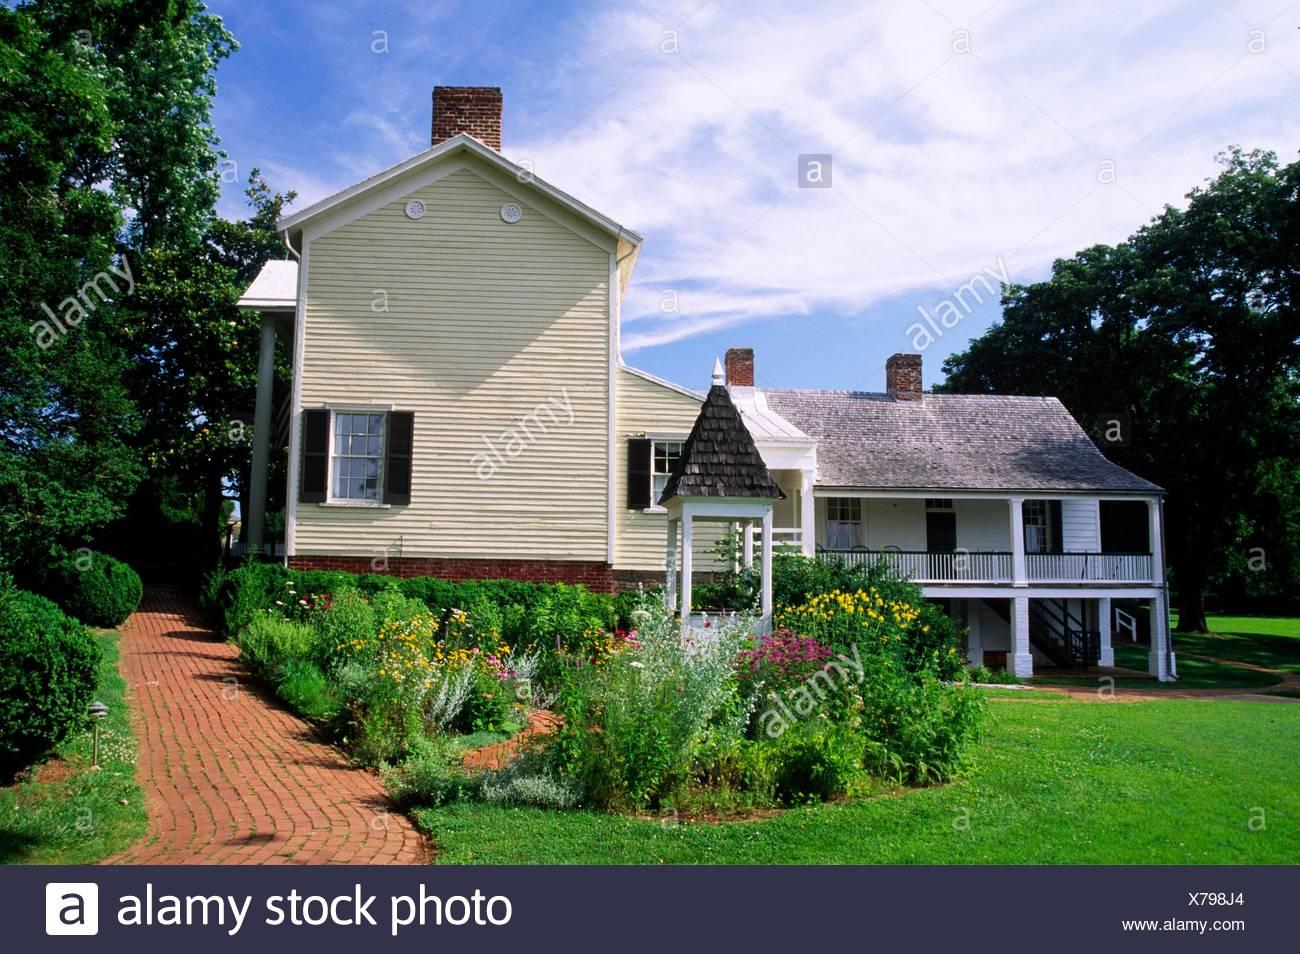 Estate house, Ash Lawn-Highland (Monroe estate), Virginia. - Stock Image